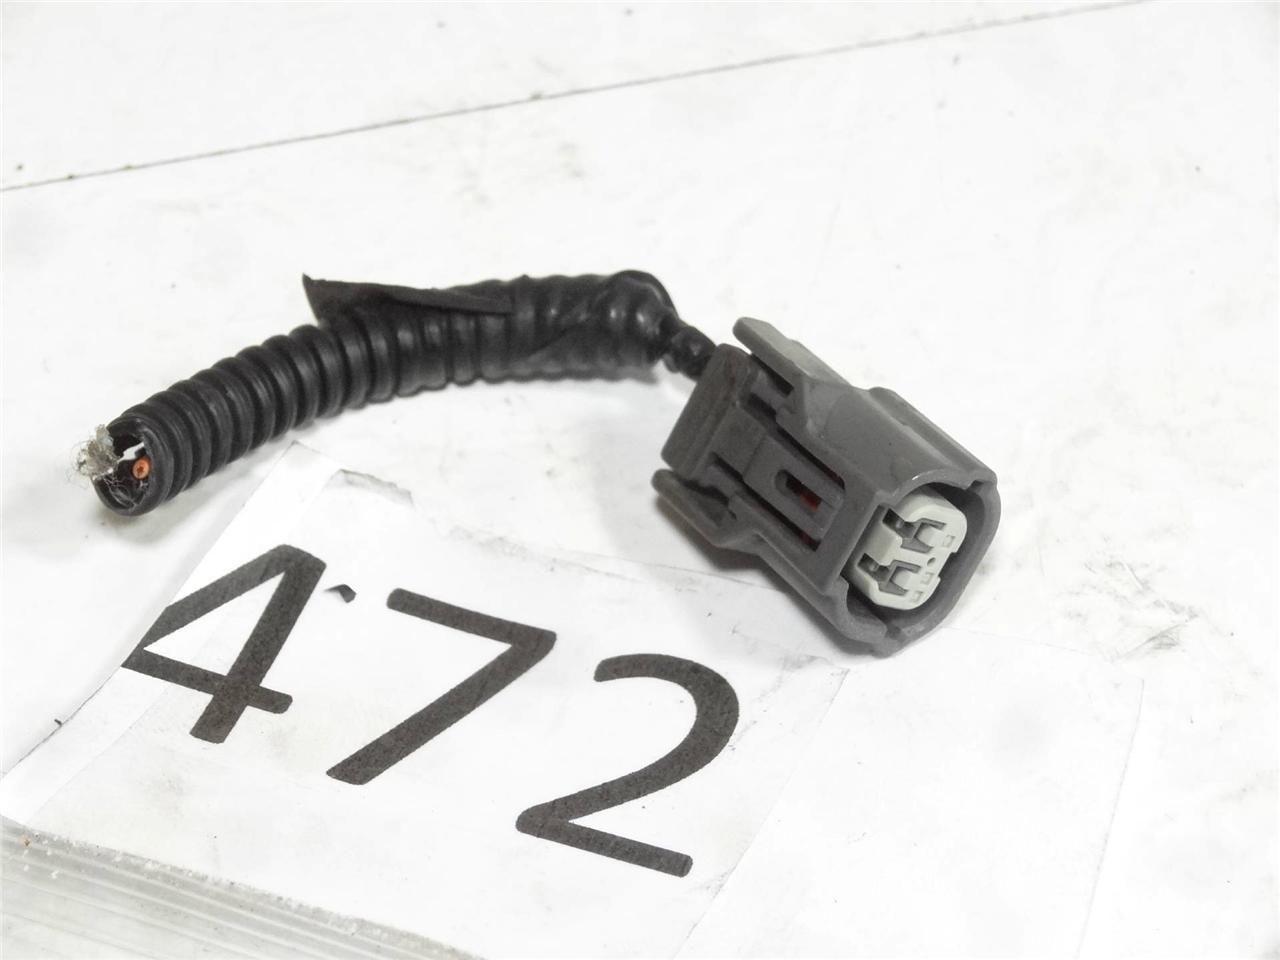 2006-2011 HONDA CIVIC CONNECTOR PIGTAIL MASTER BRAKE CYLINDER  OEM 1B472 - $14.10